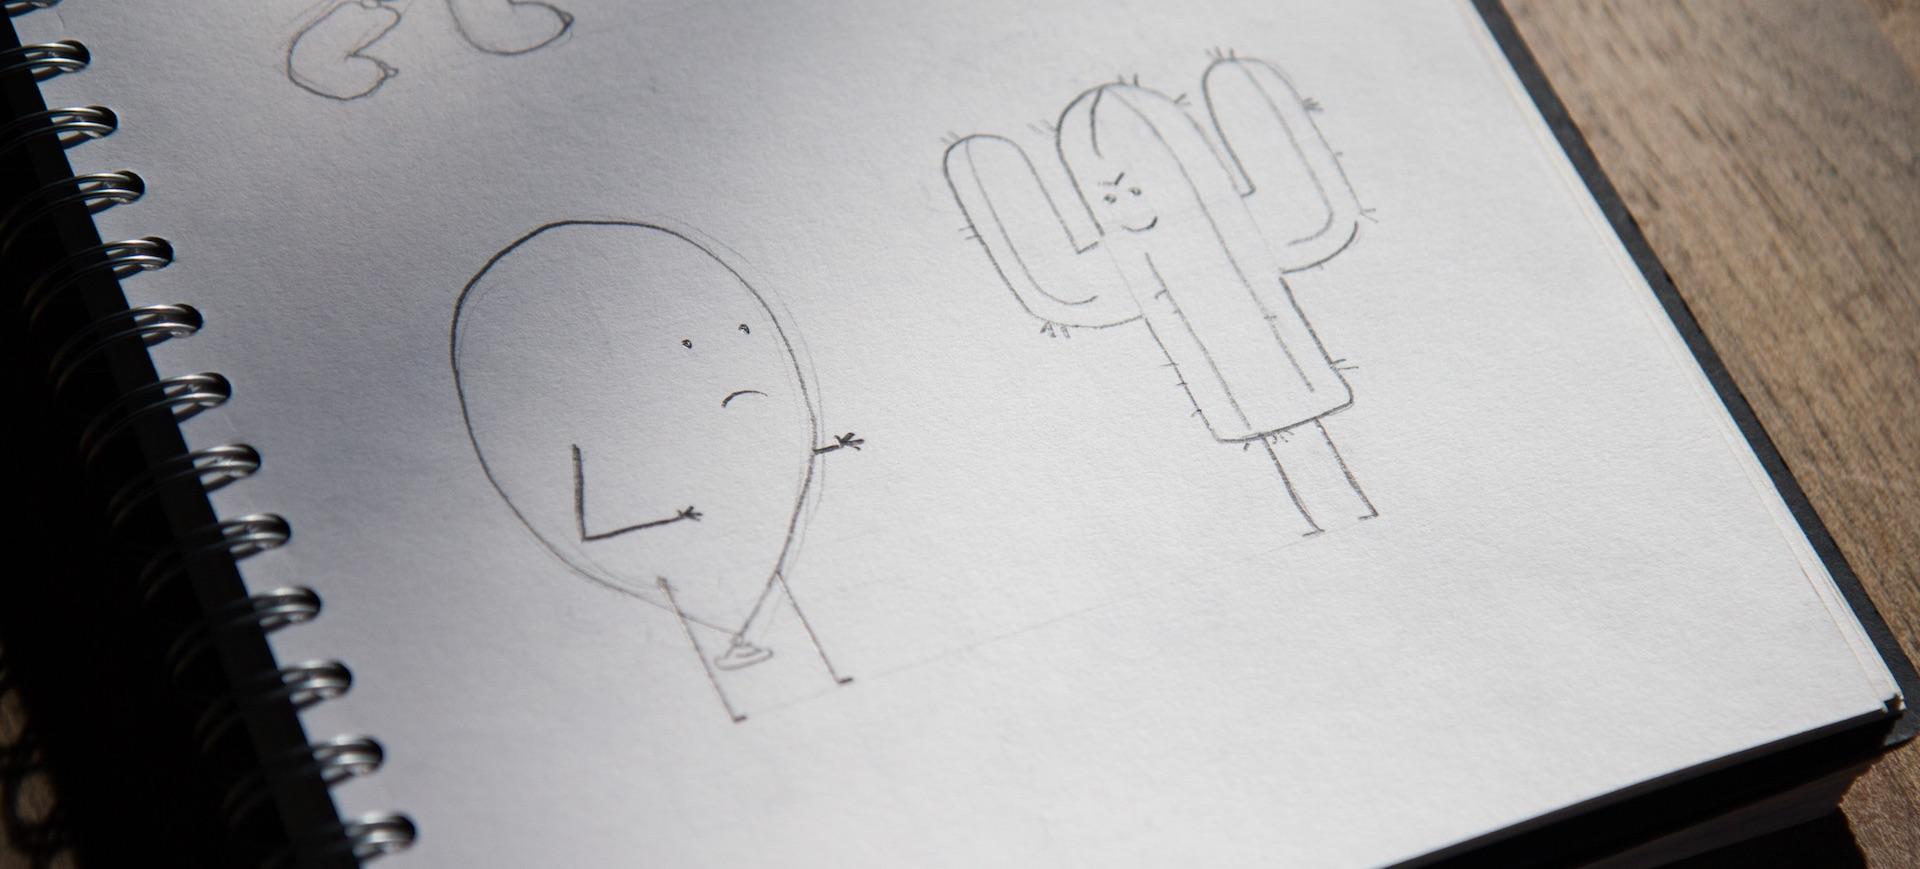 Animade-Olympops-Sketchbook